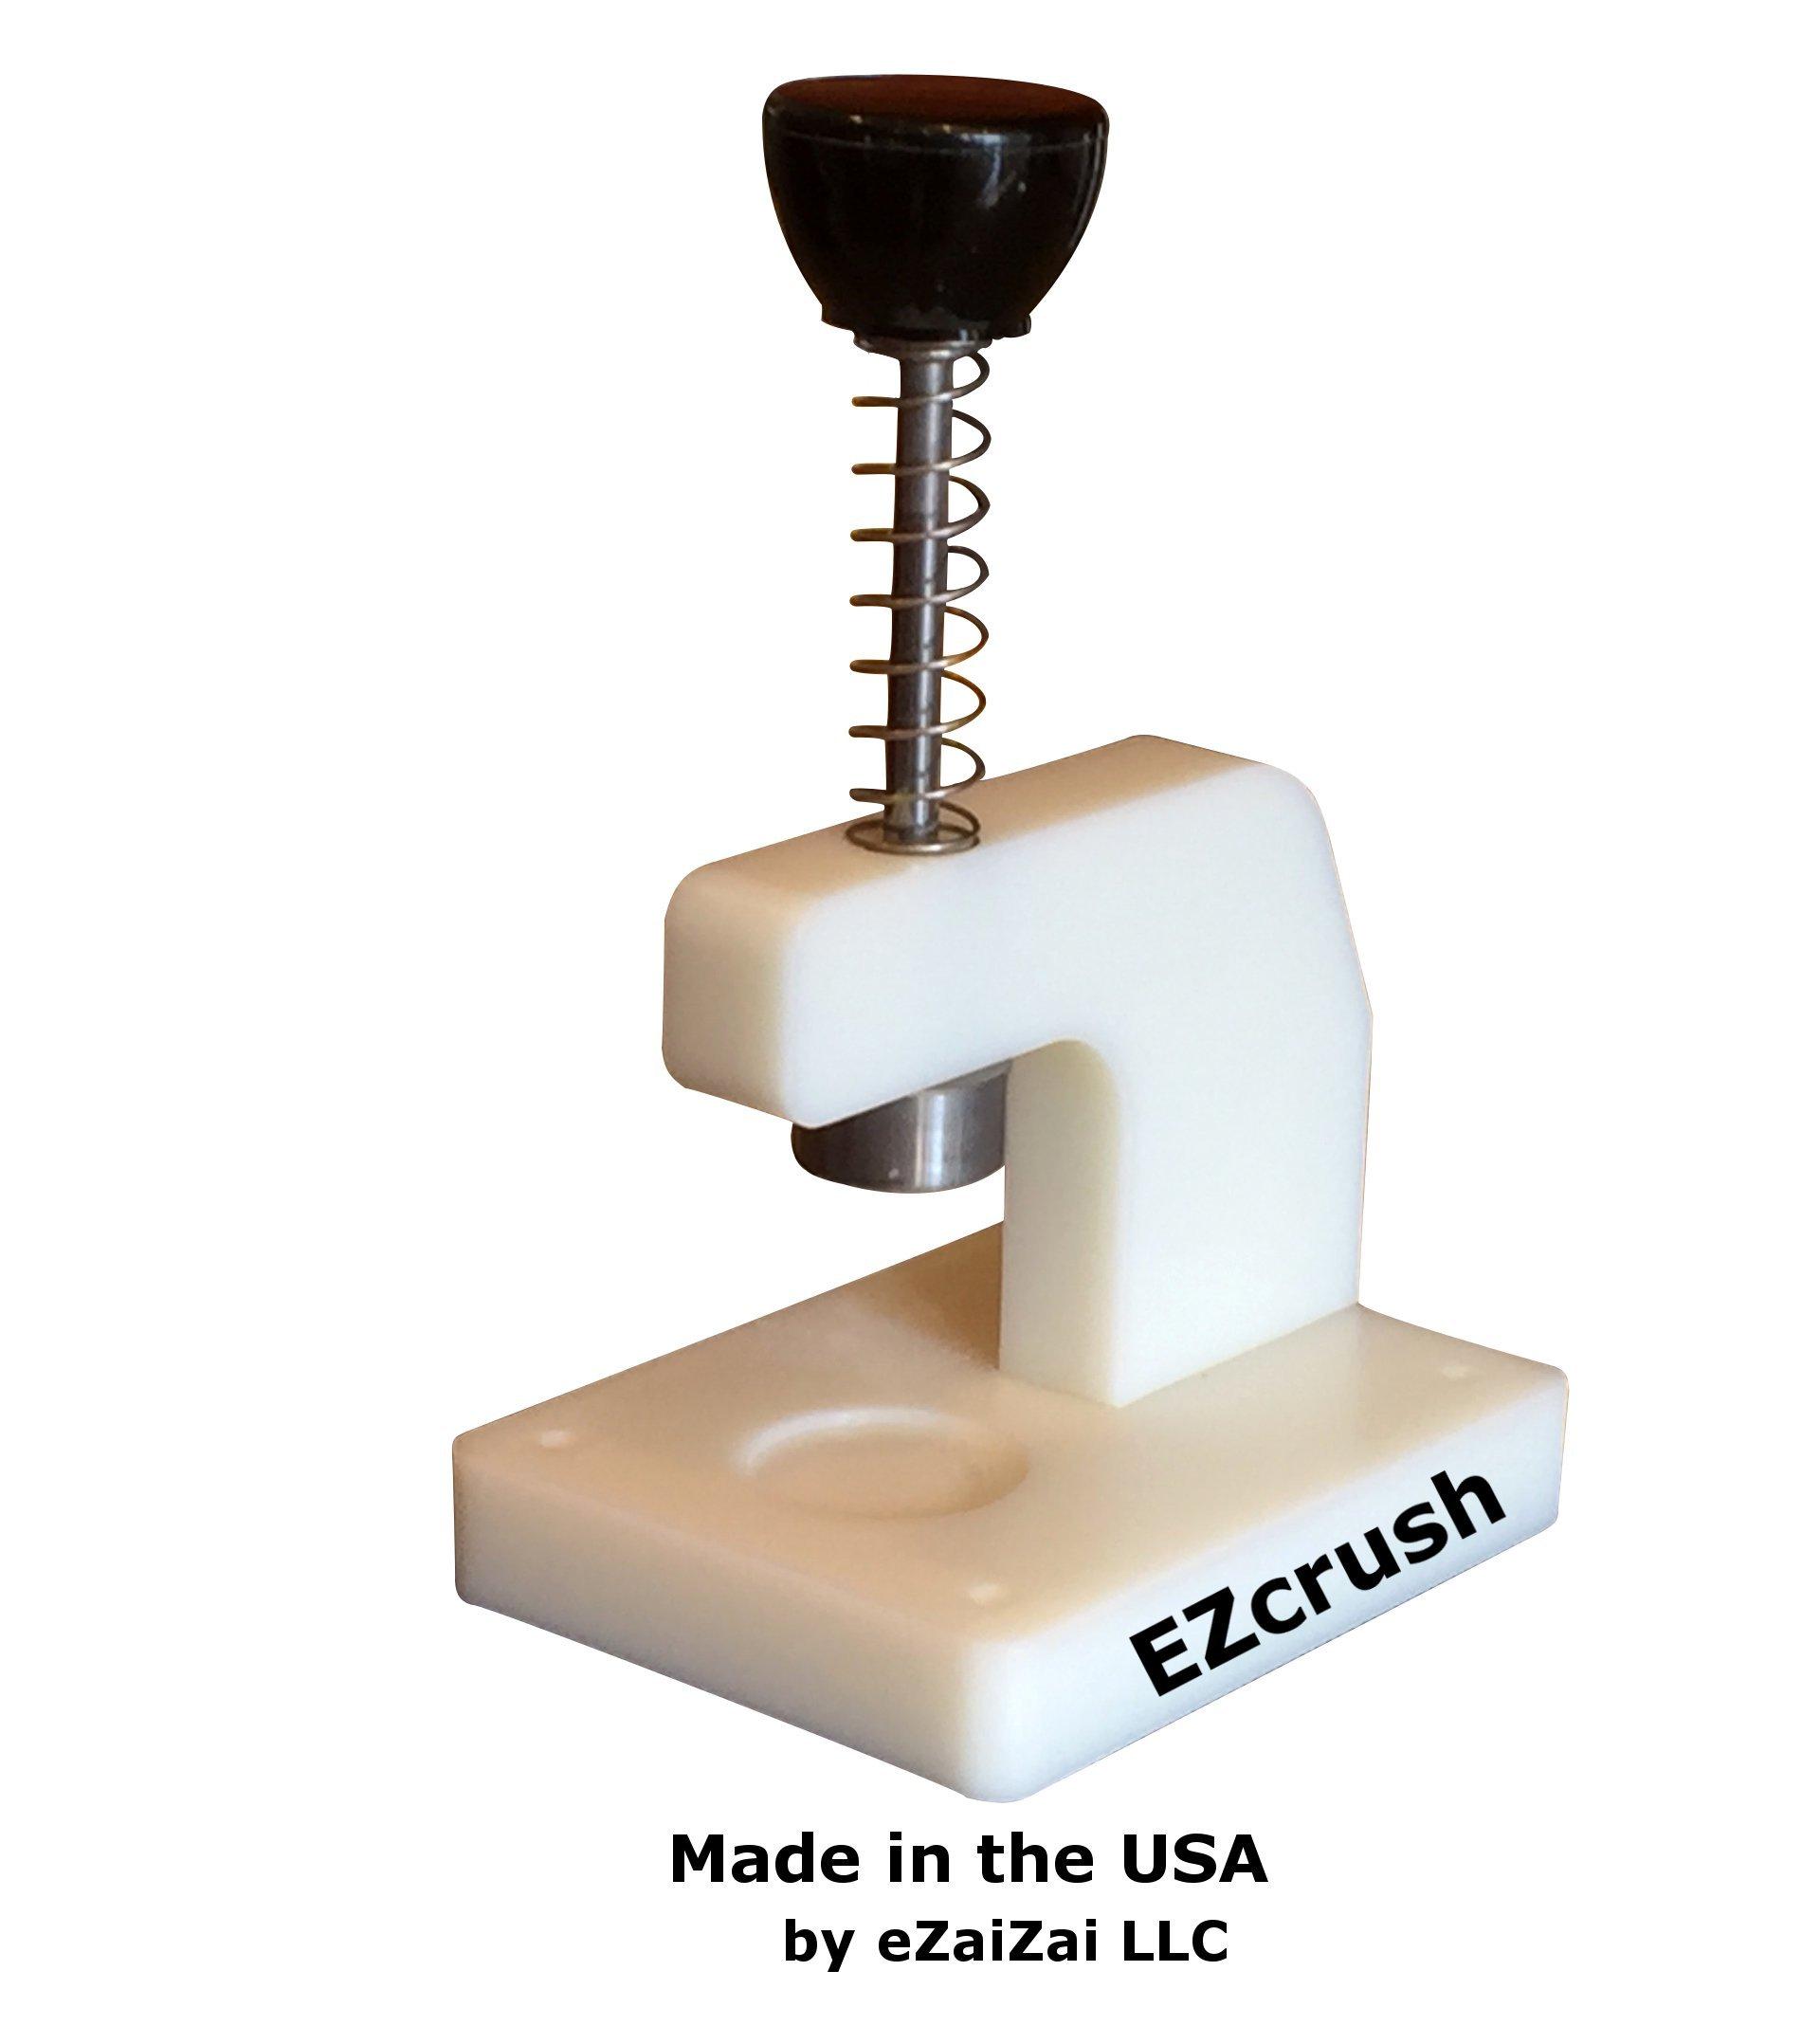 eZaiZai EZcrush pill crusher - white